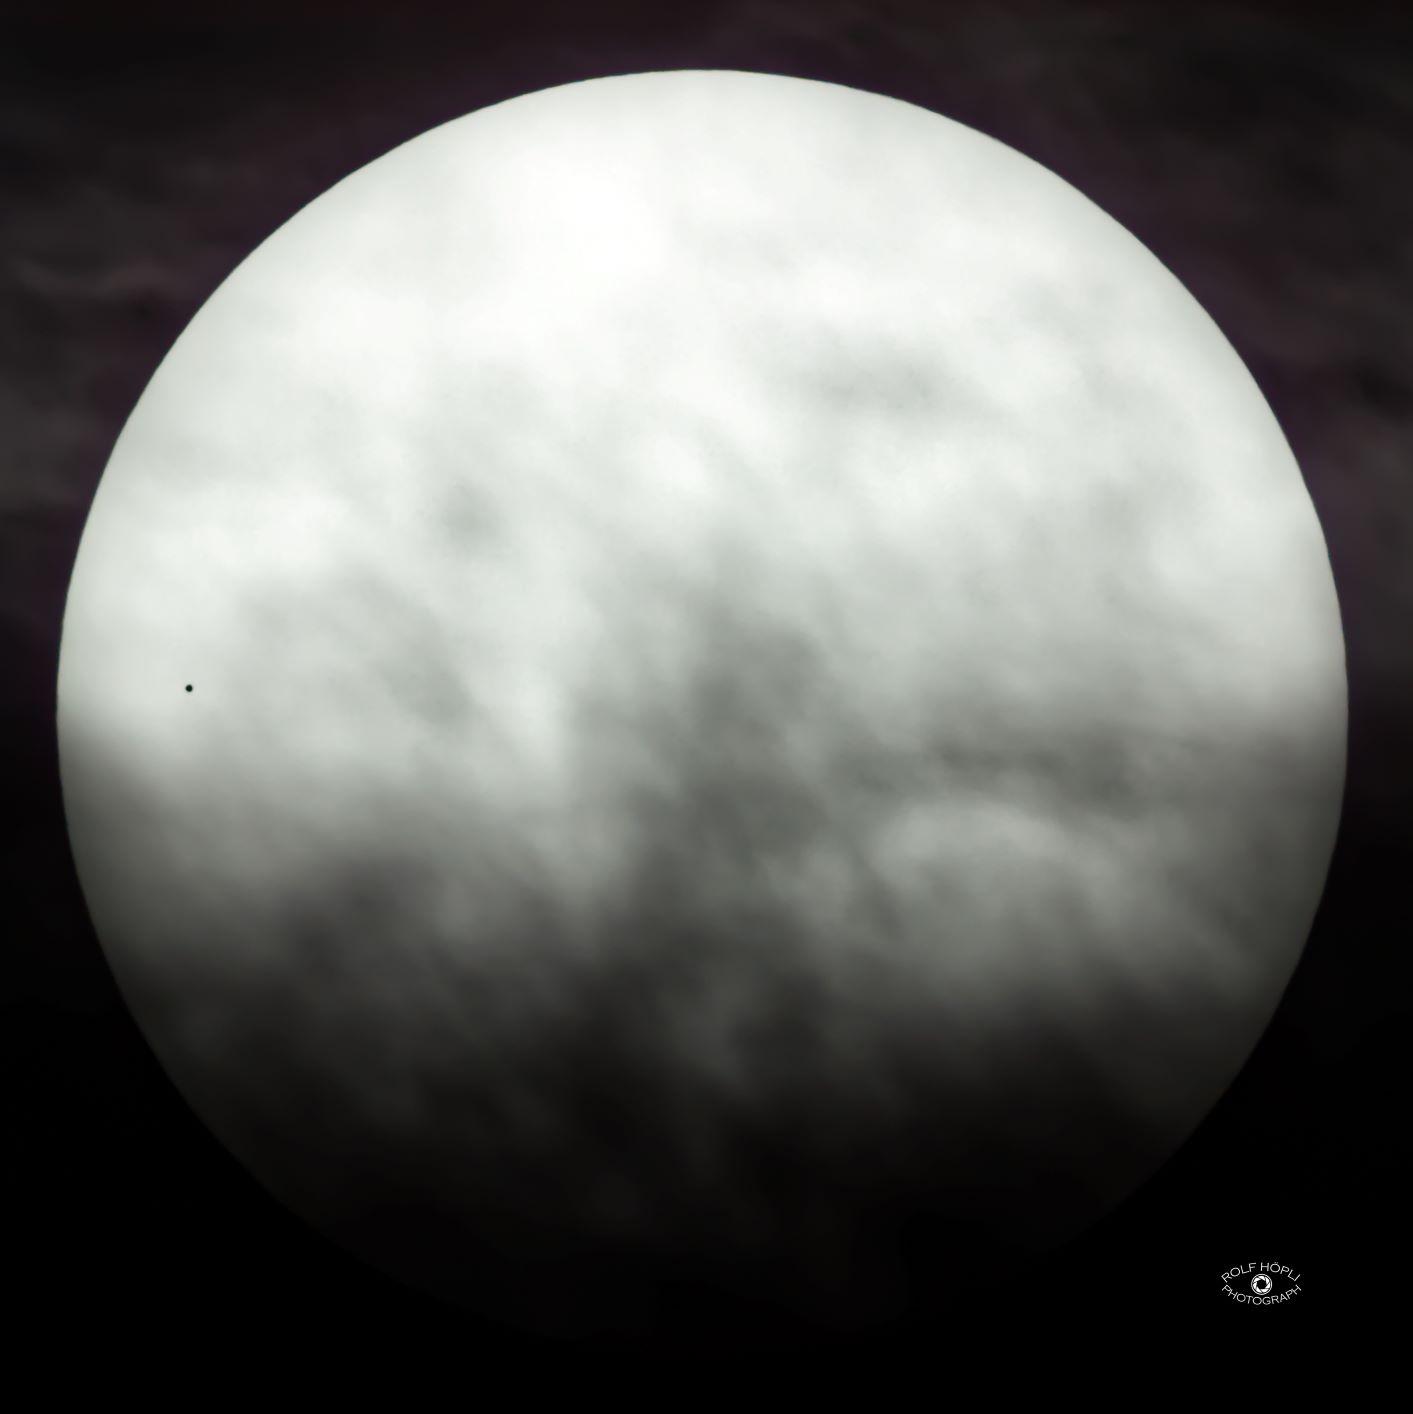 Merkurtransit2019_D73_0680_M